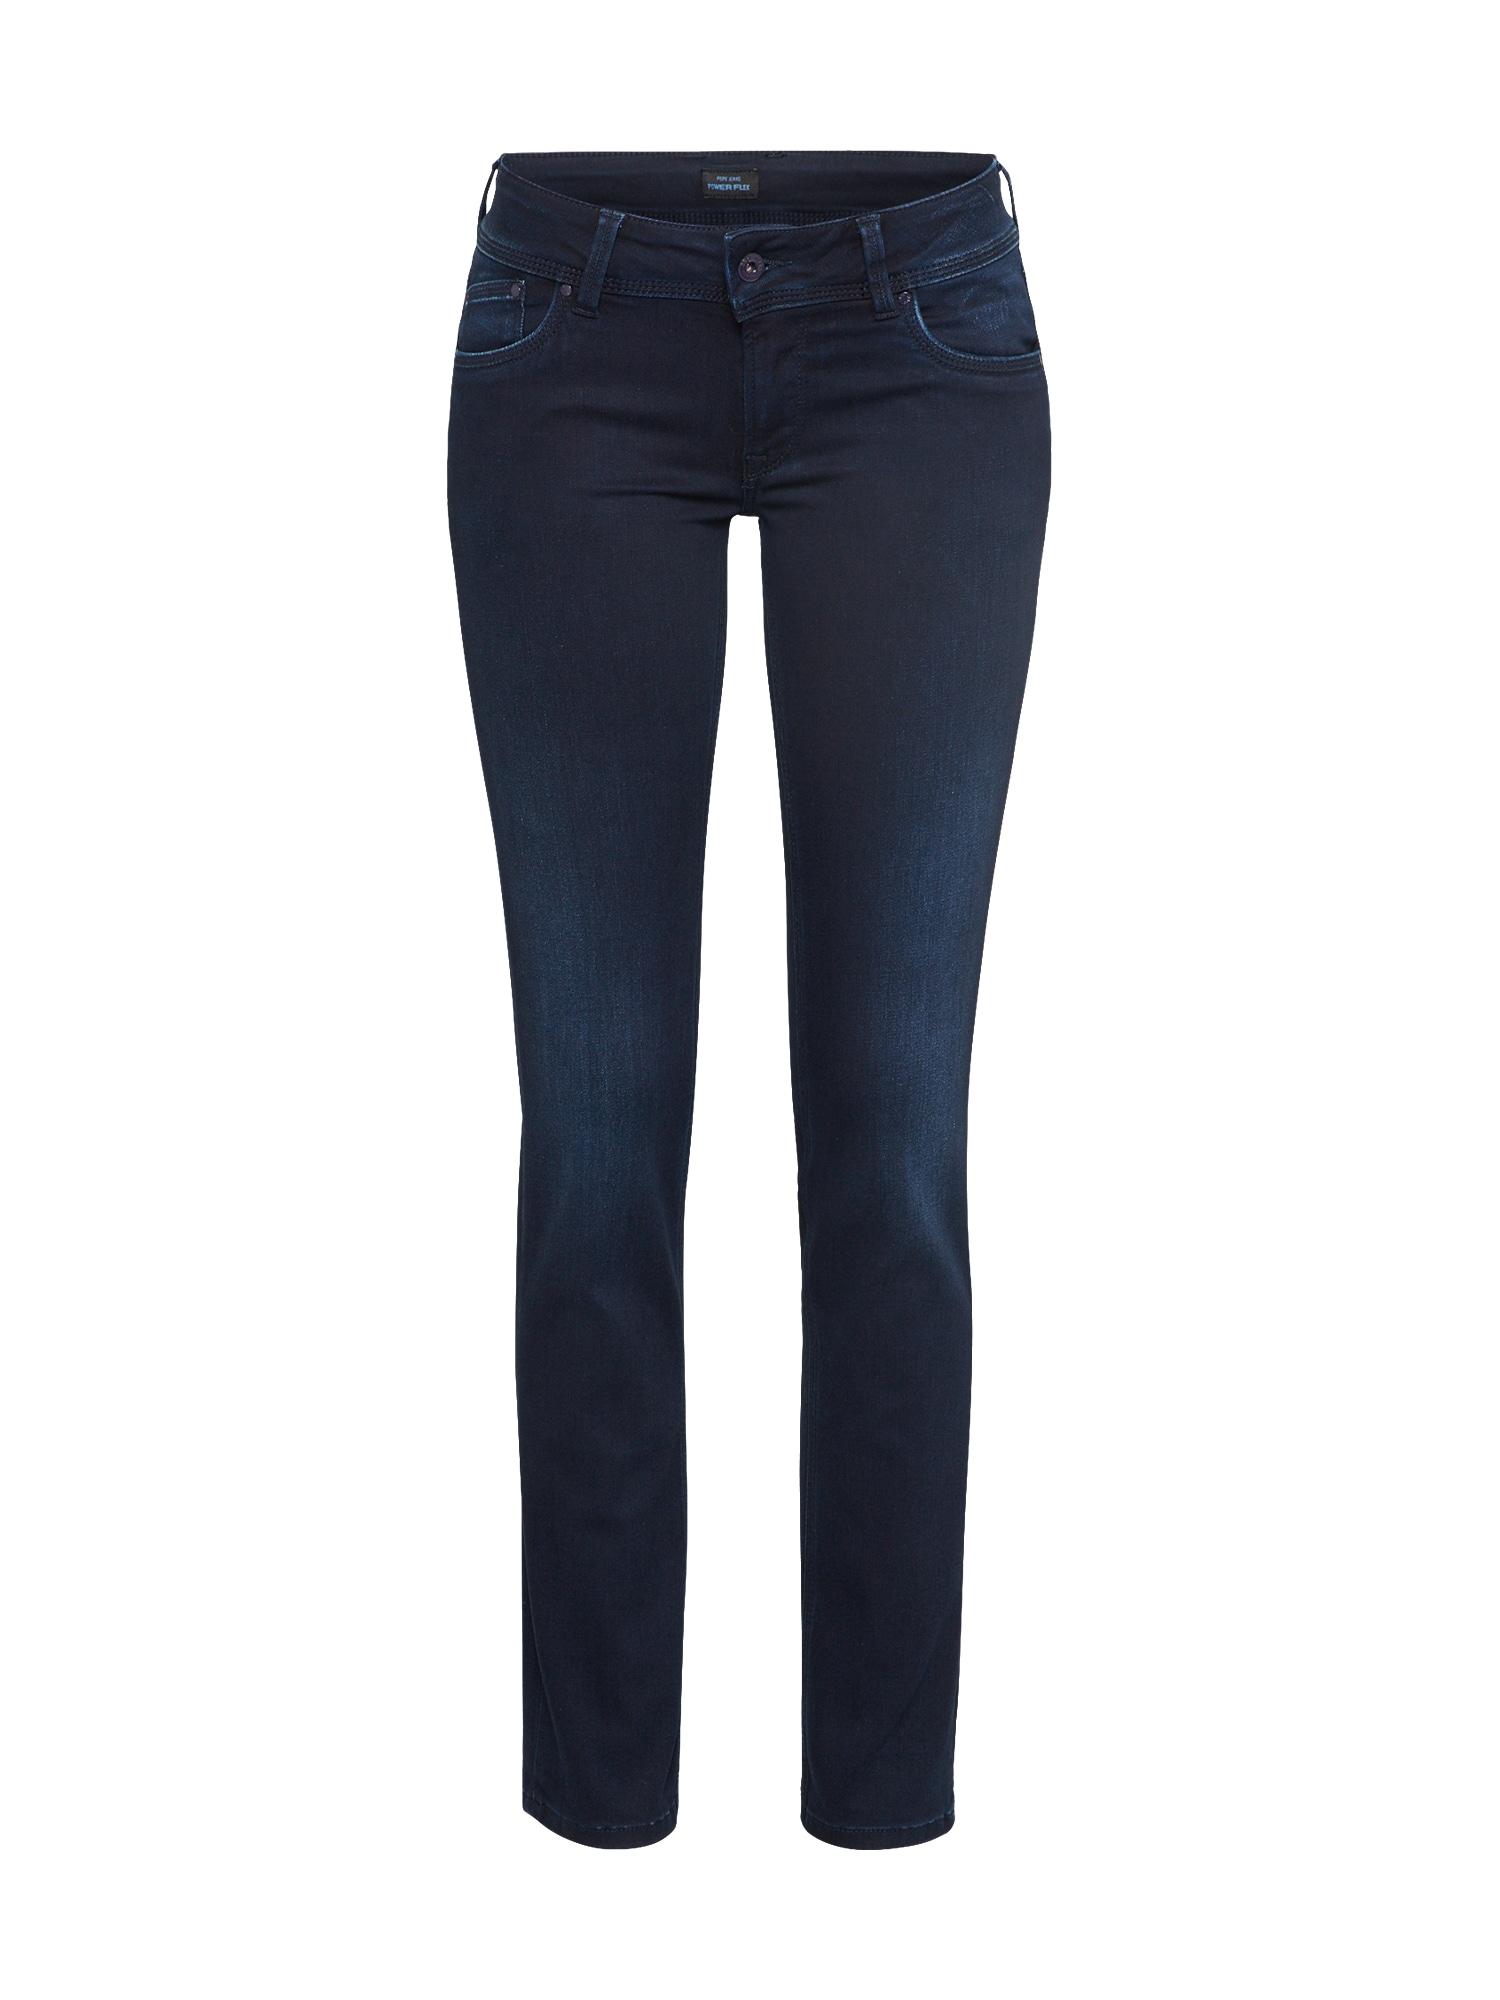 Pepe Jeans Dames Jeans Saturn blue denim